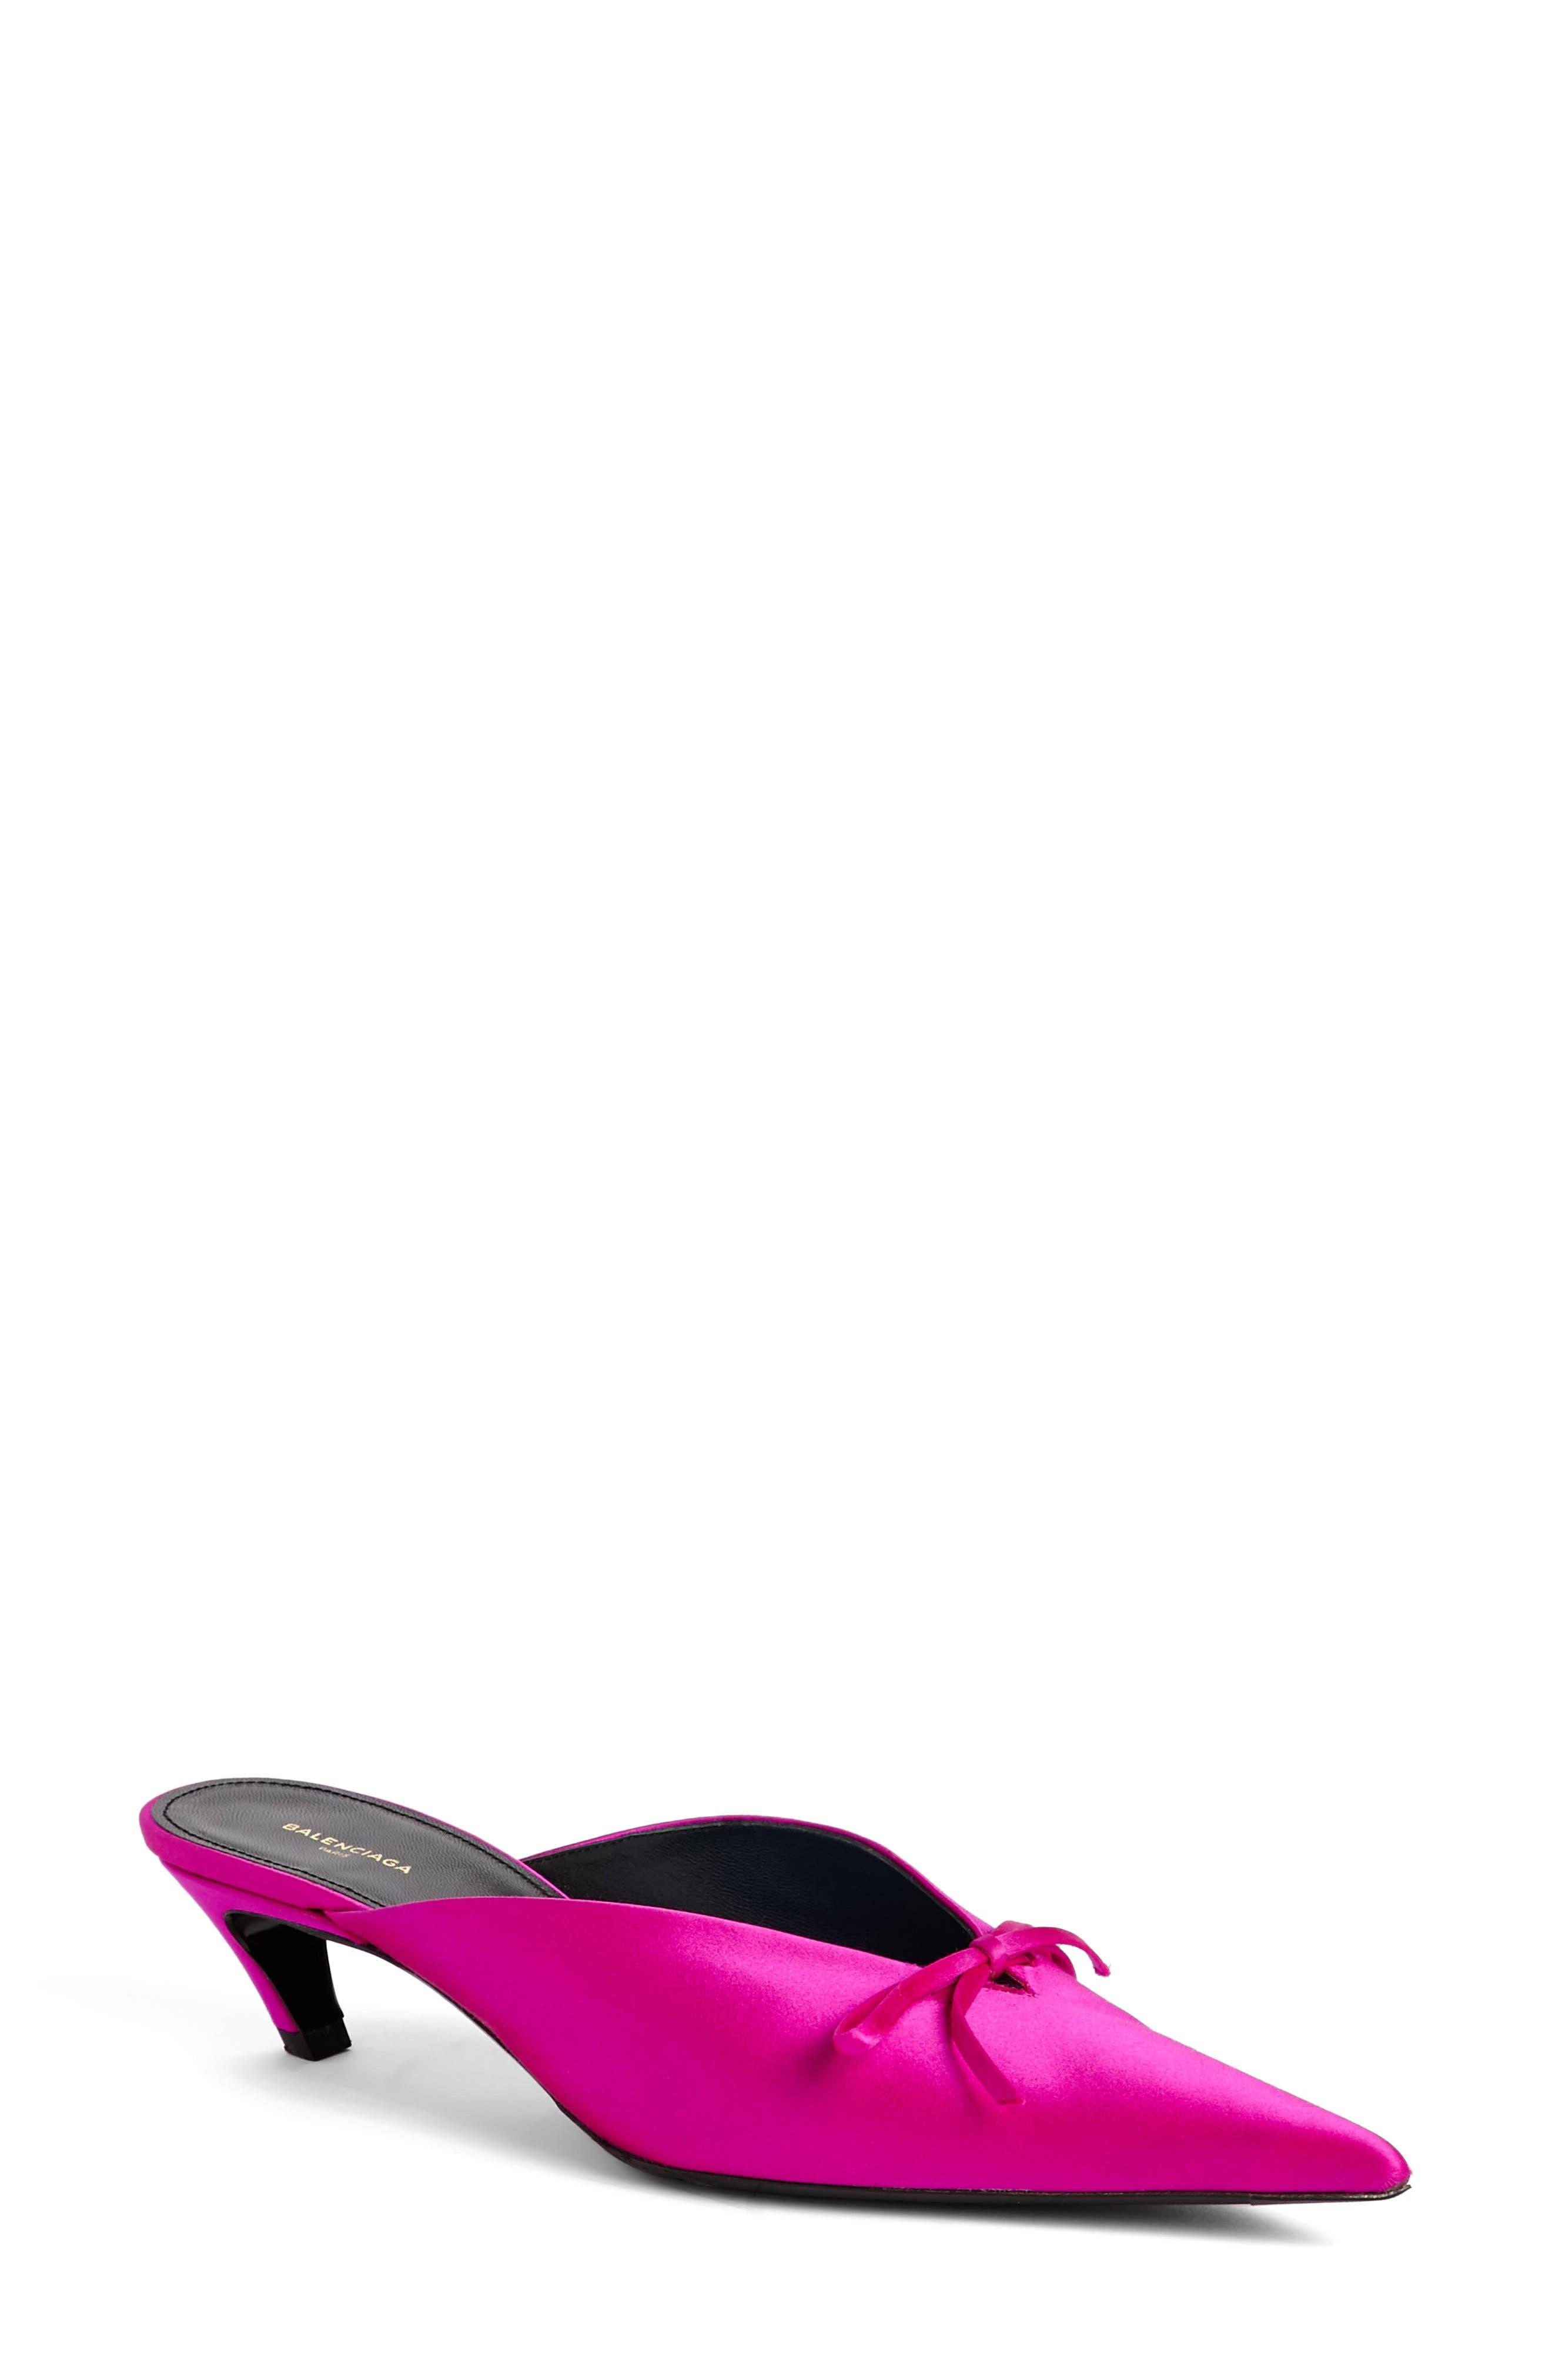 Alternate Image 1 Selected - Balenciaga Pointy Toe Mule (Women)